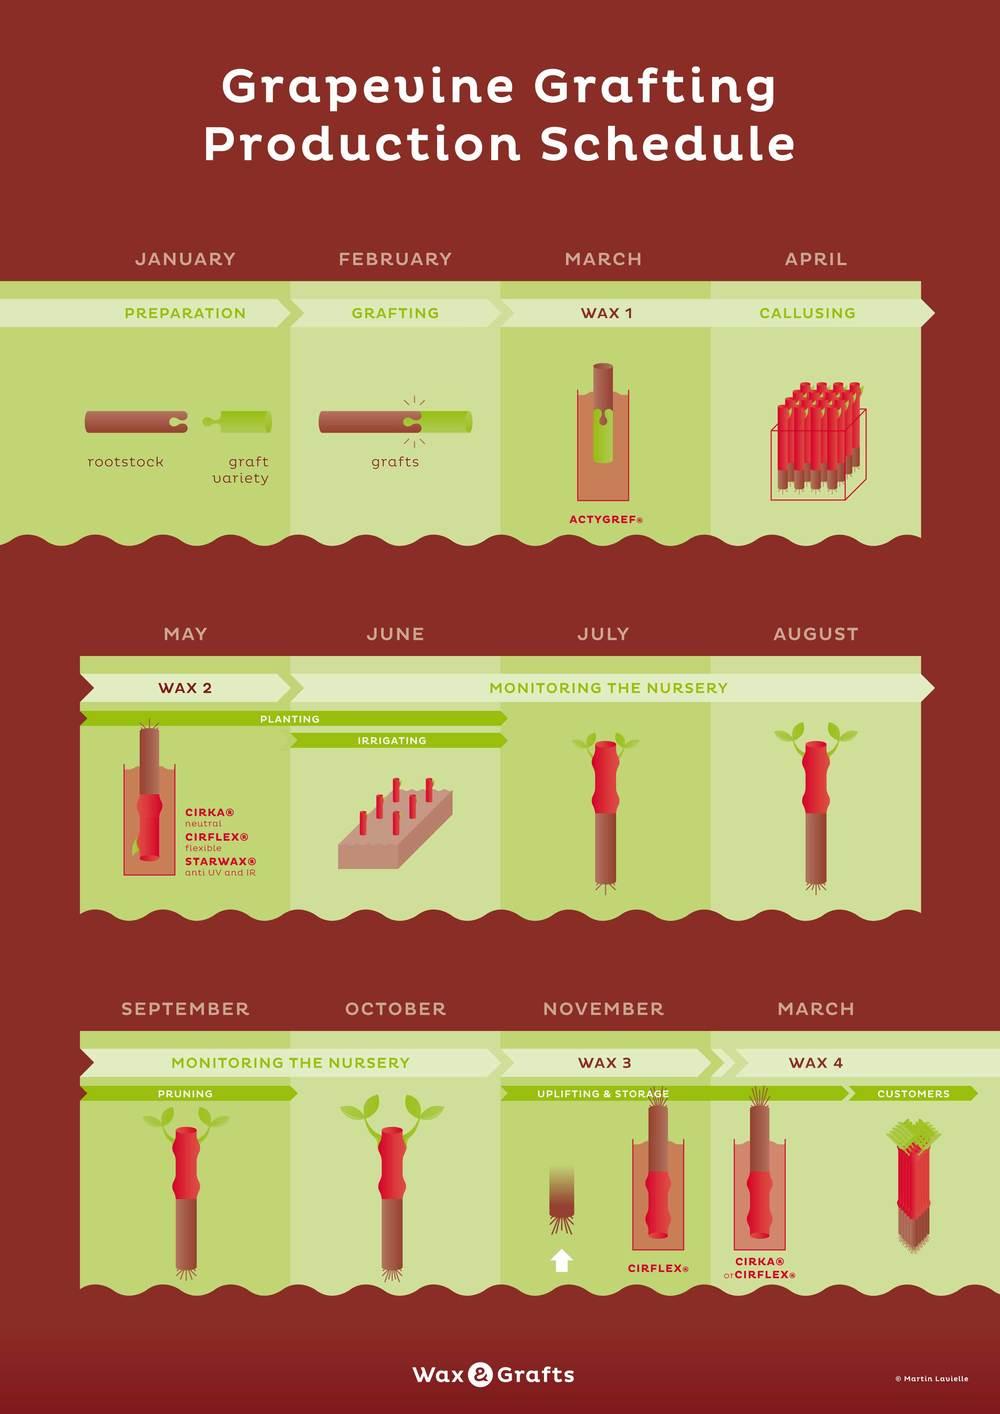 Vine plant production process (Nothern hemishpere)